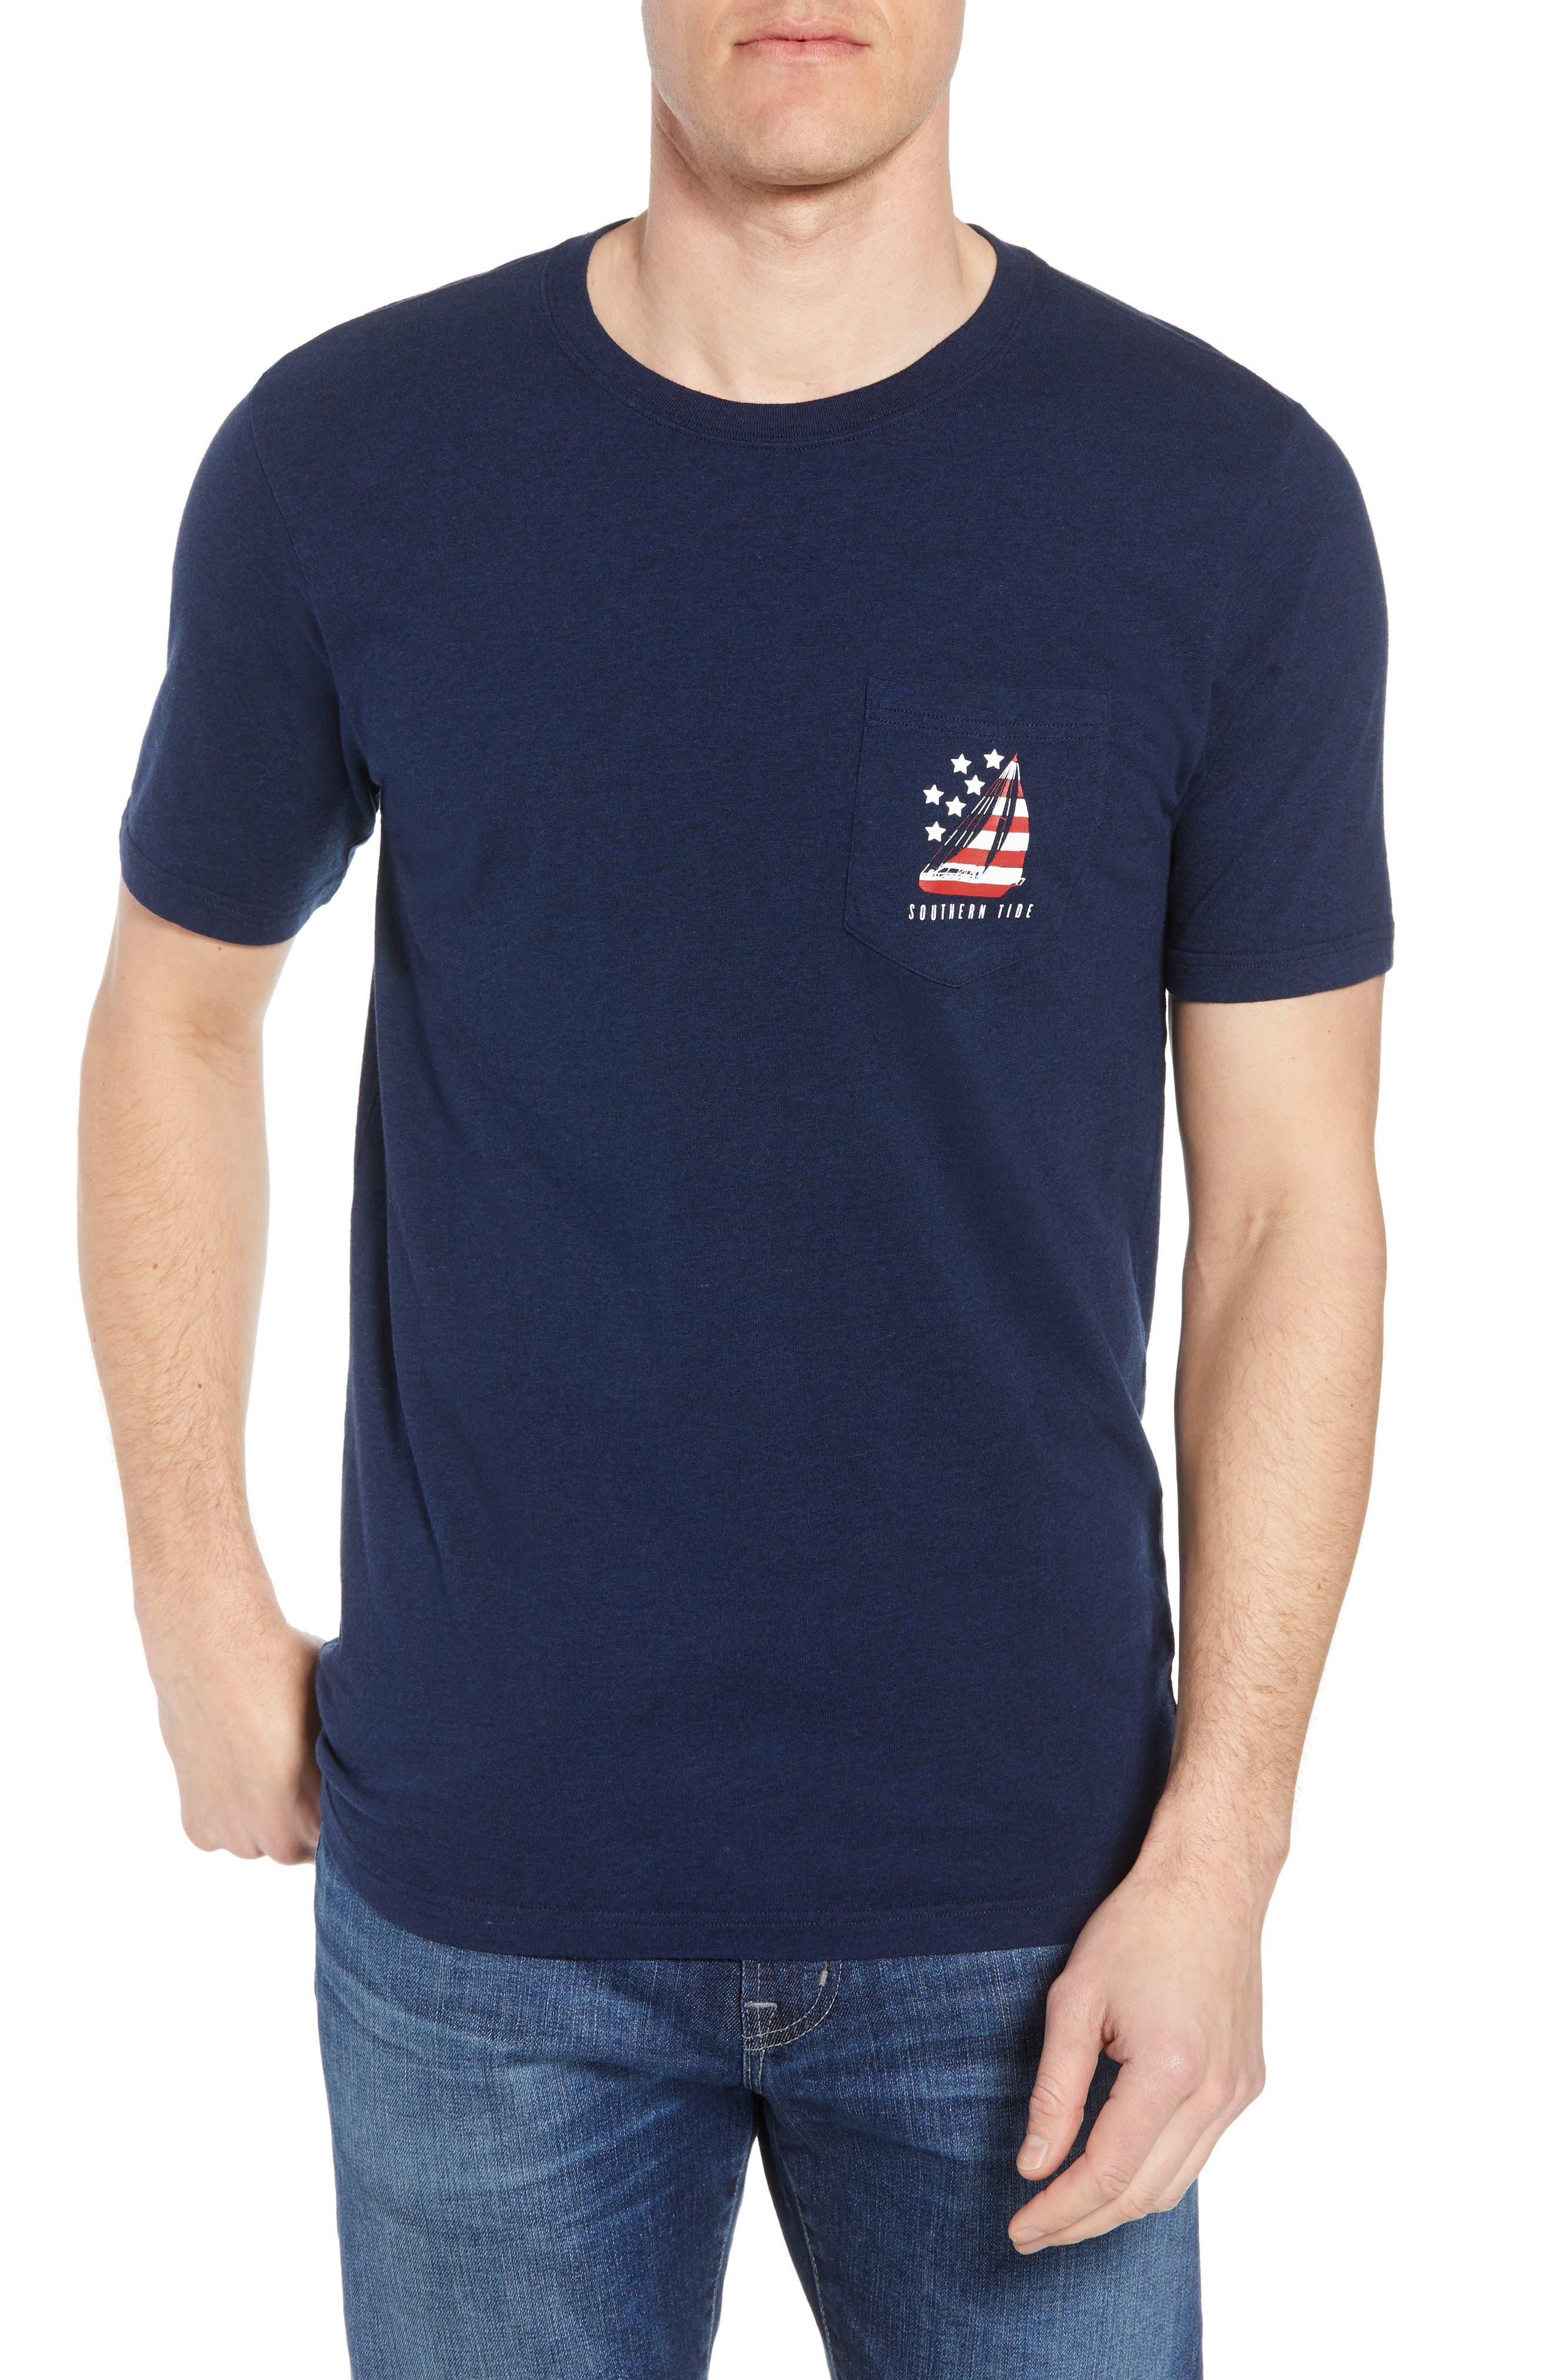 Southern Tide Patriotic Sail Regular Fit T-Shirt